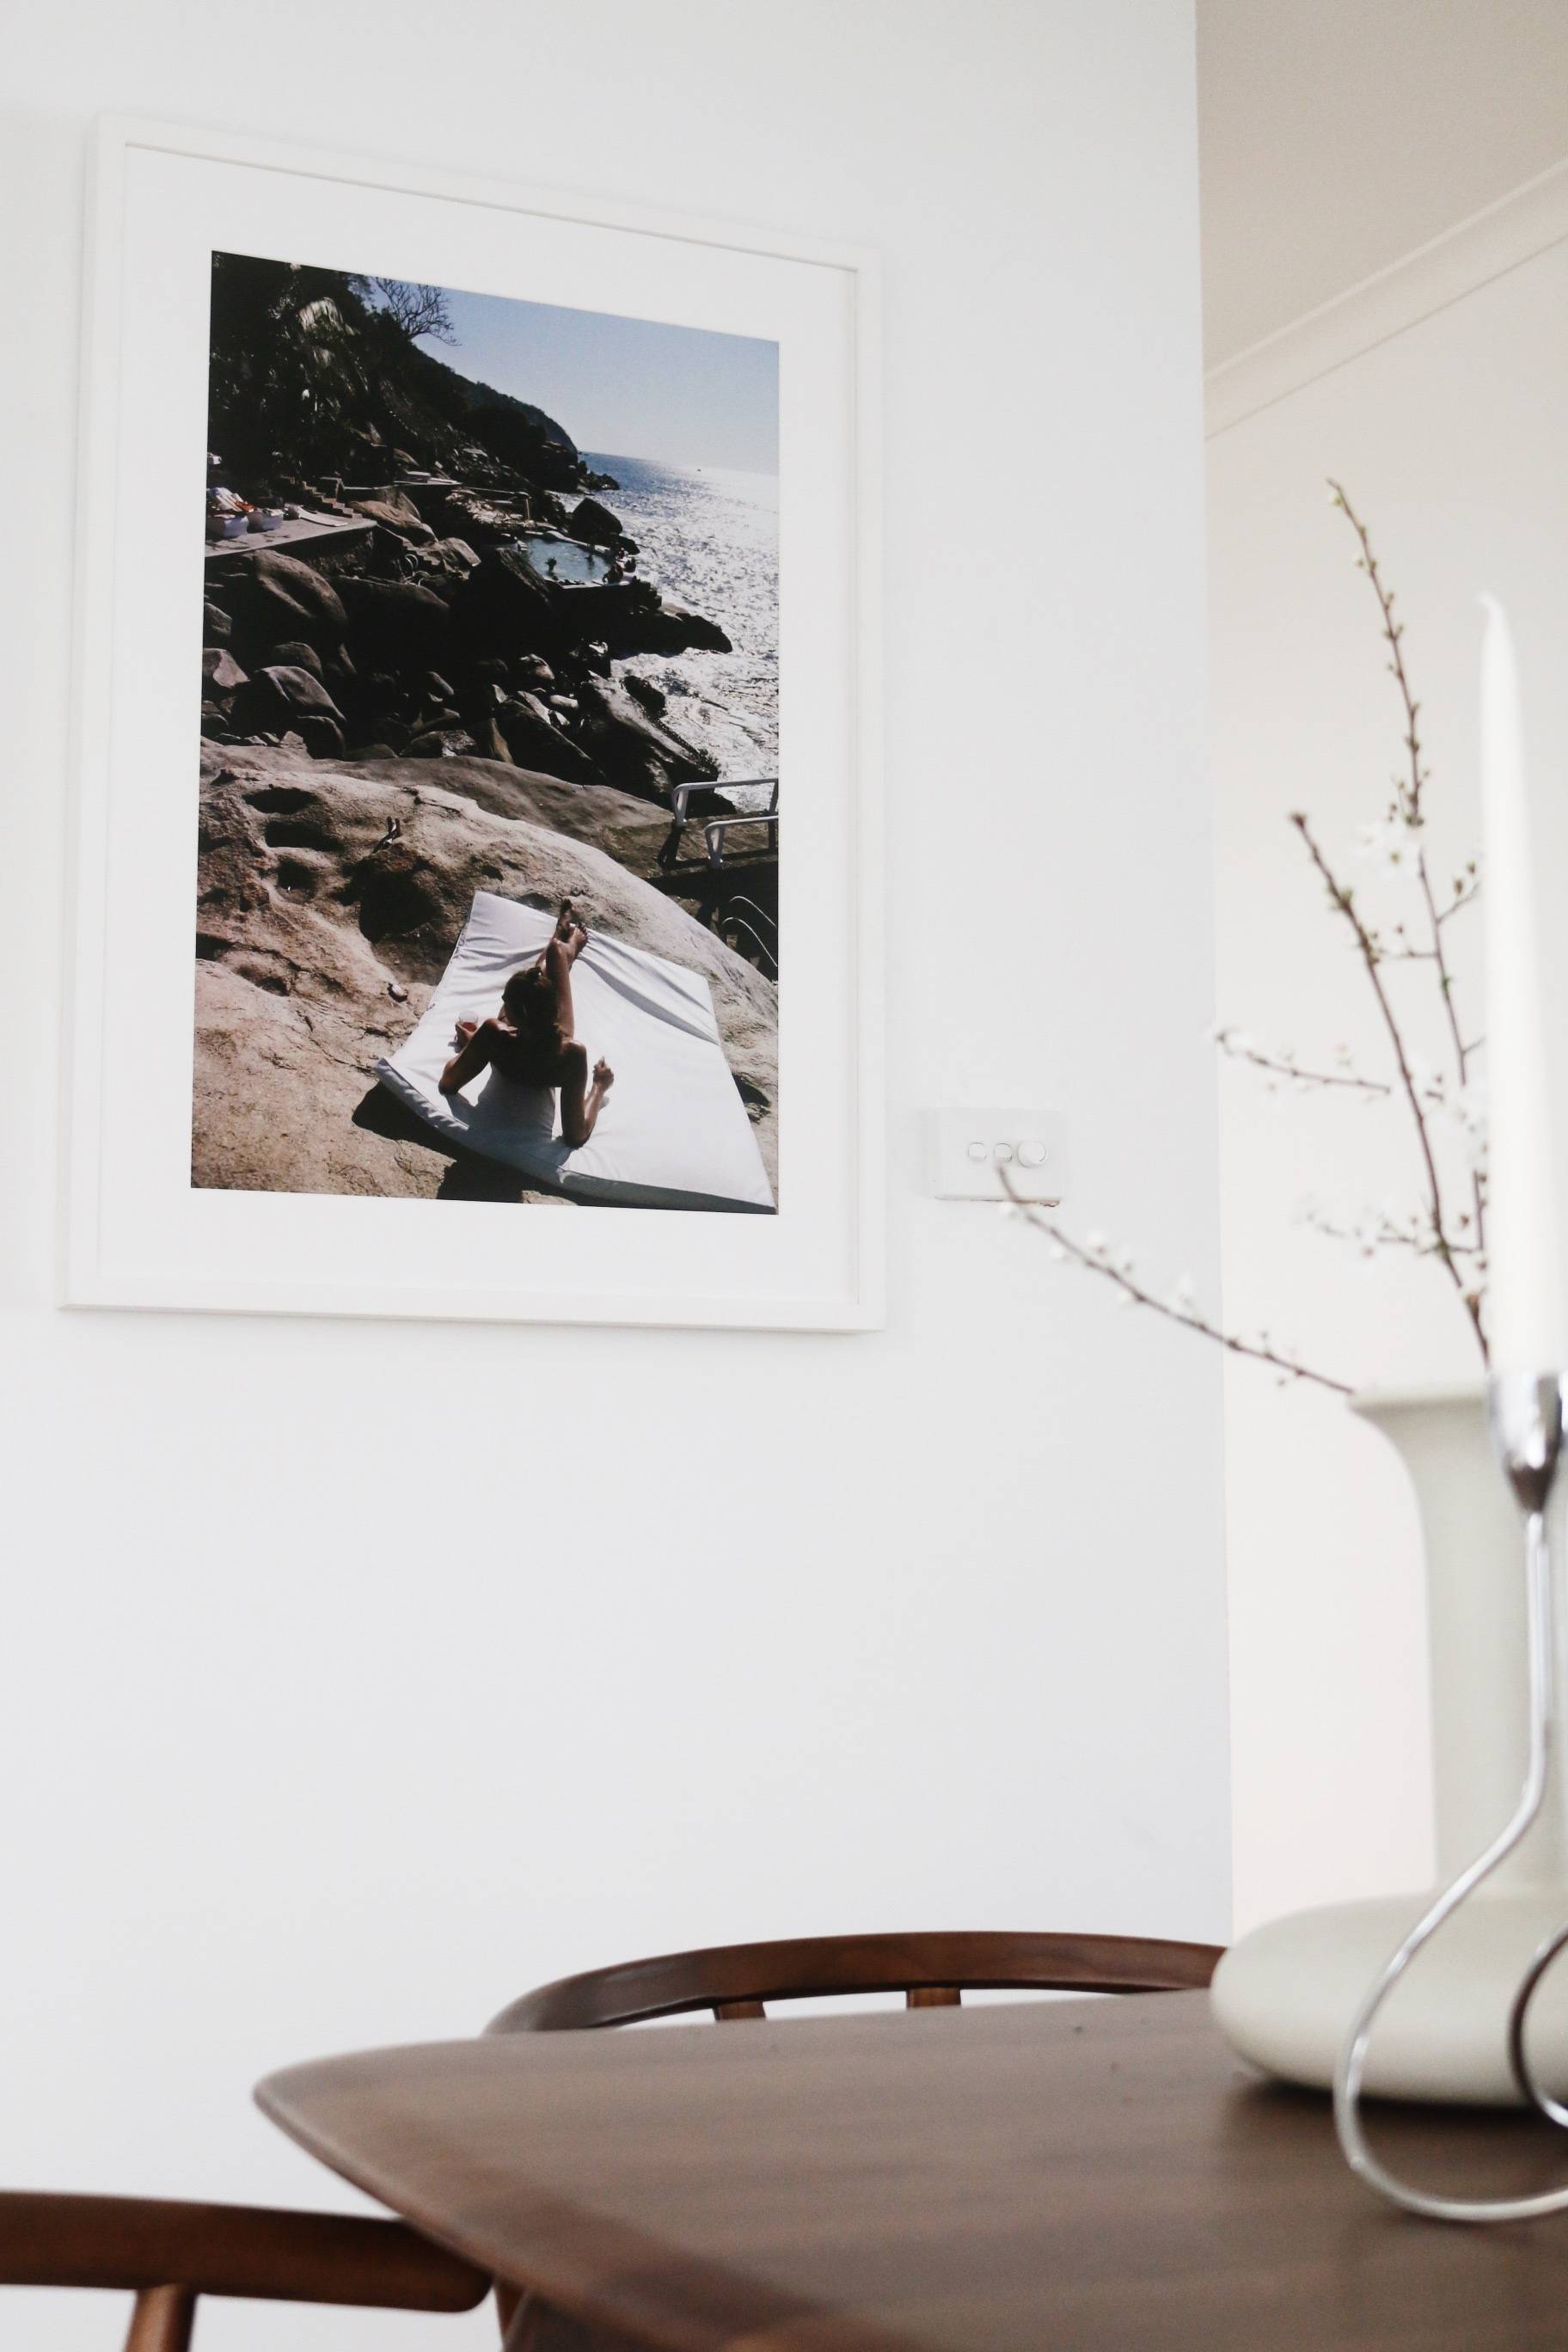 Las Brisas by Slim Aarons - Hanging in the home of Gemma Watts